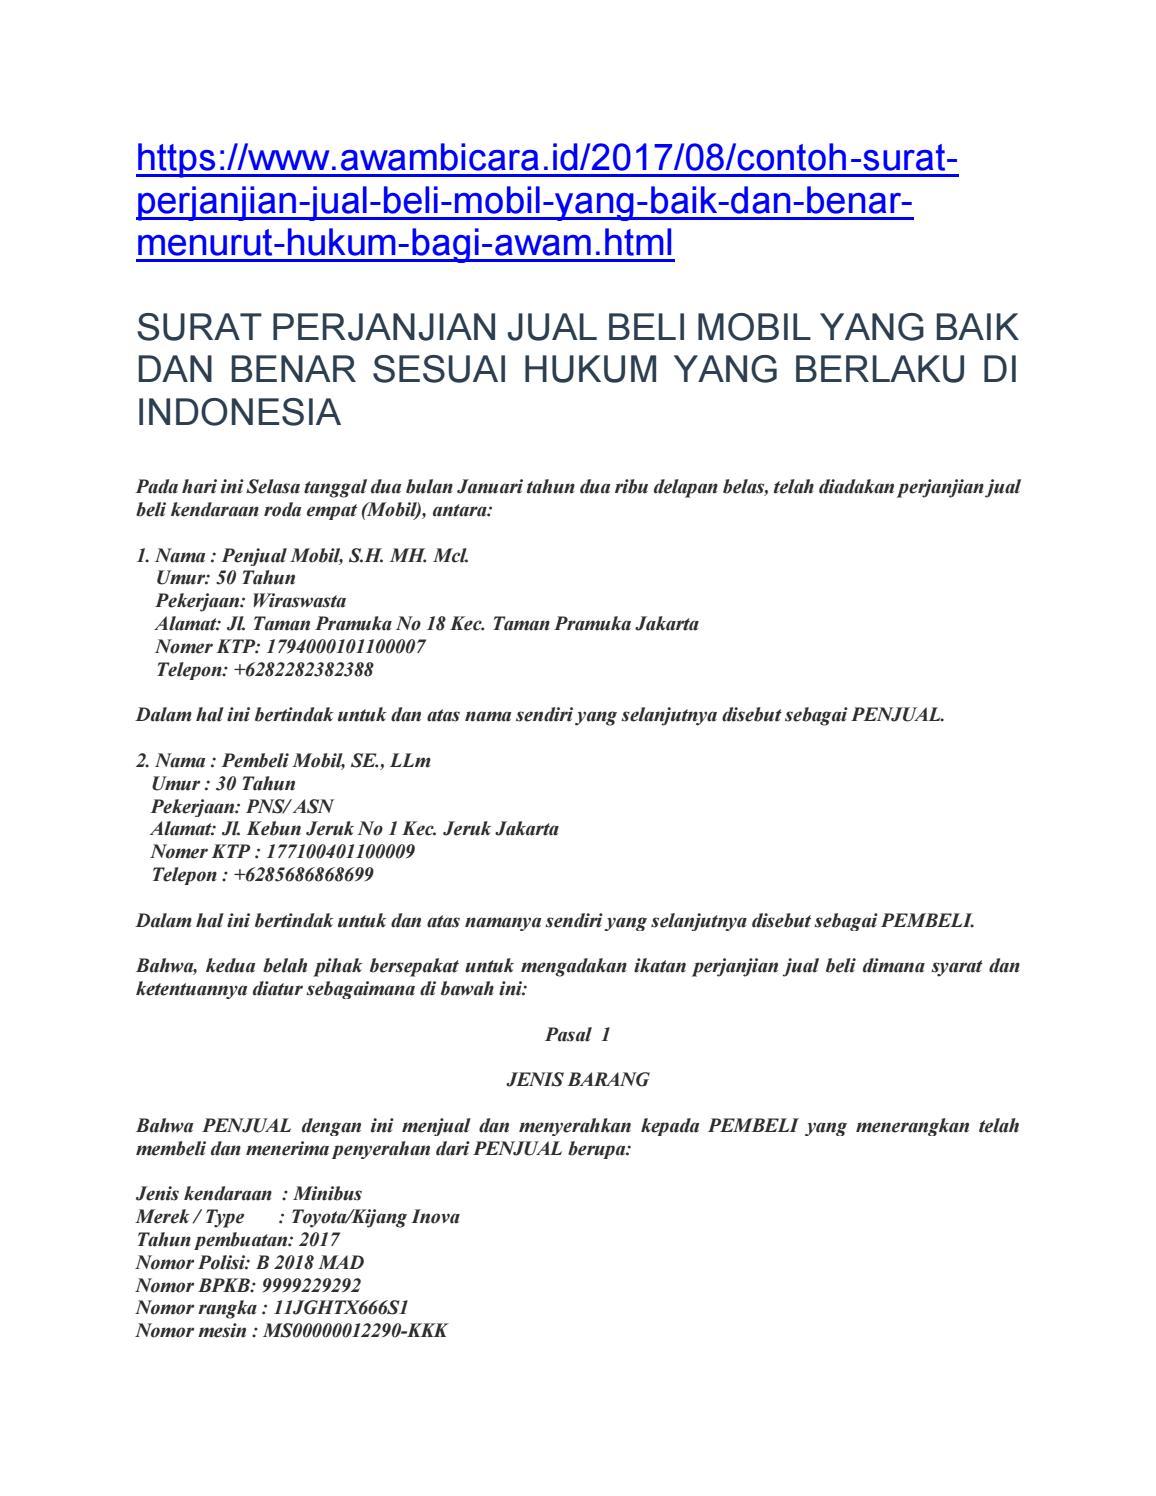 Perjanjian Jual Beli Mobil By Netizen Deddy Supriyadi Issuu